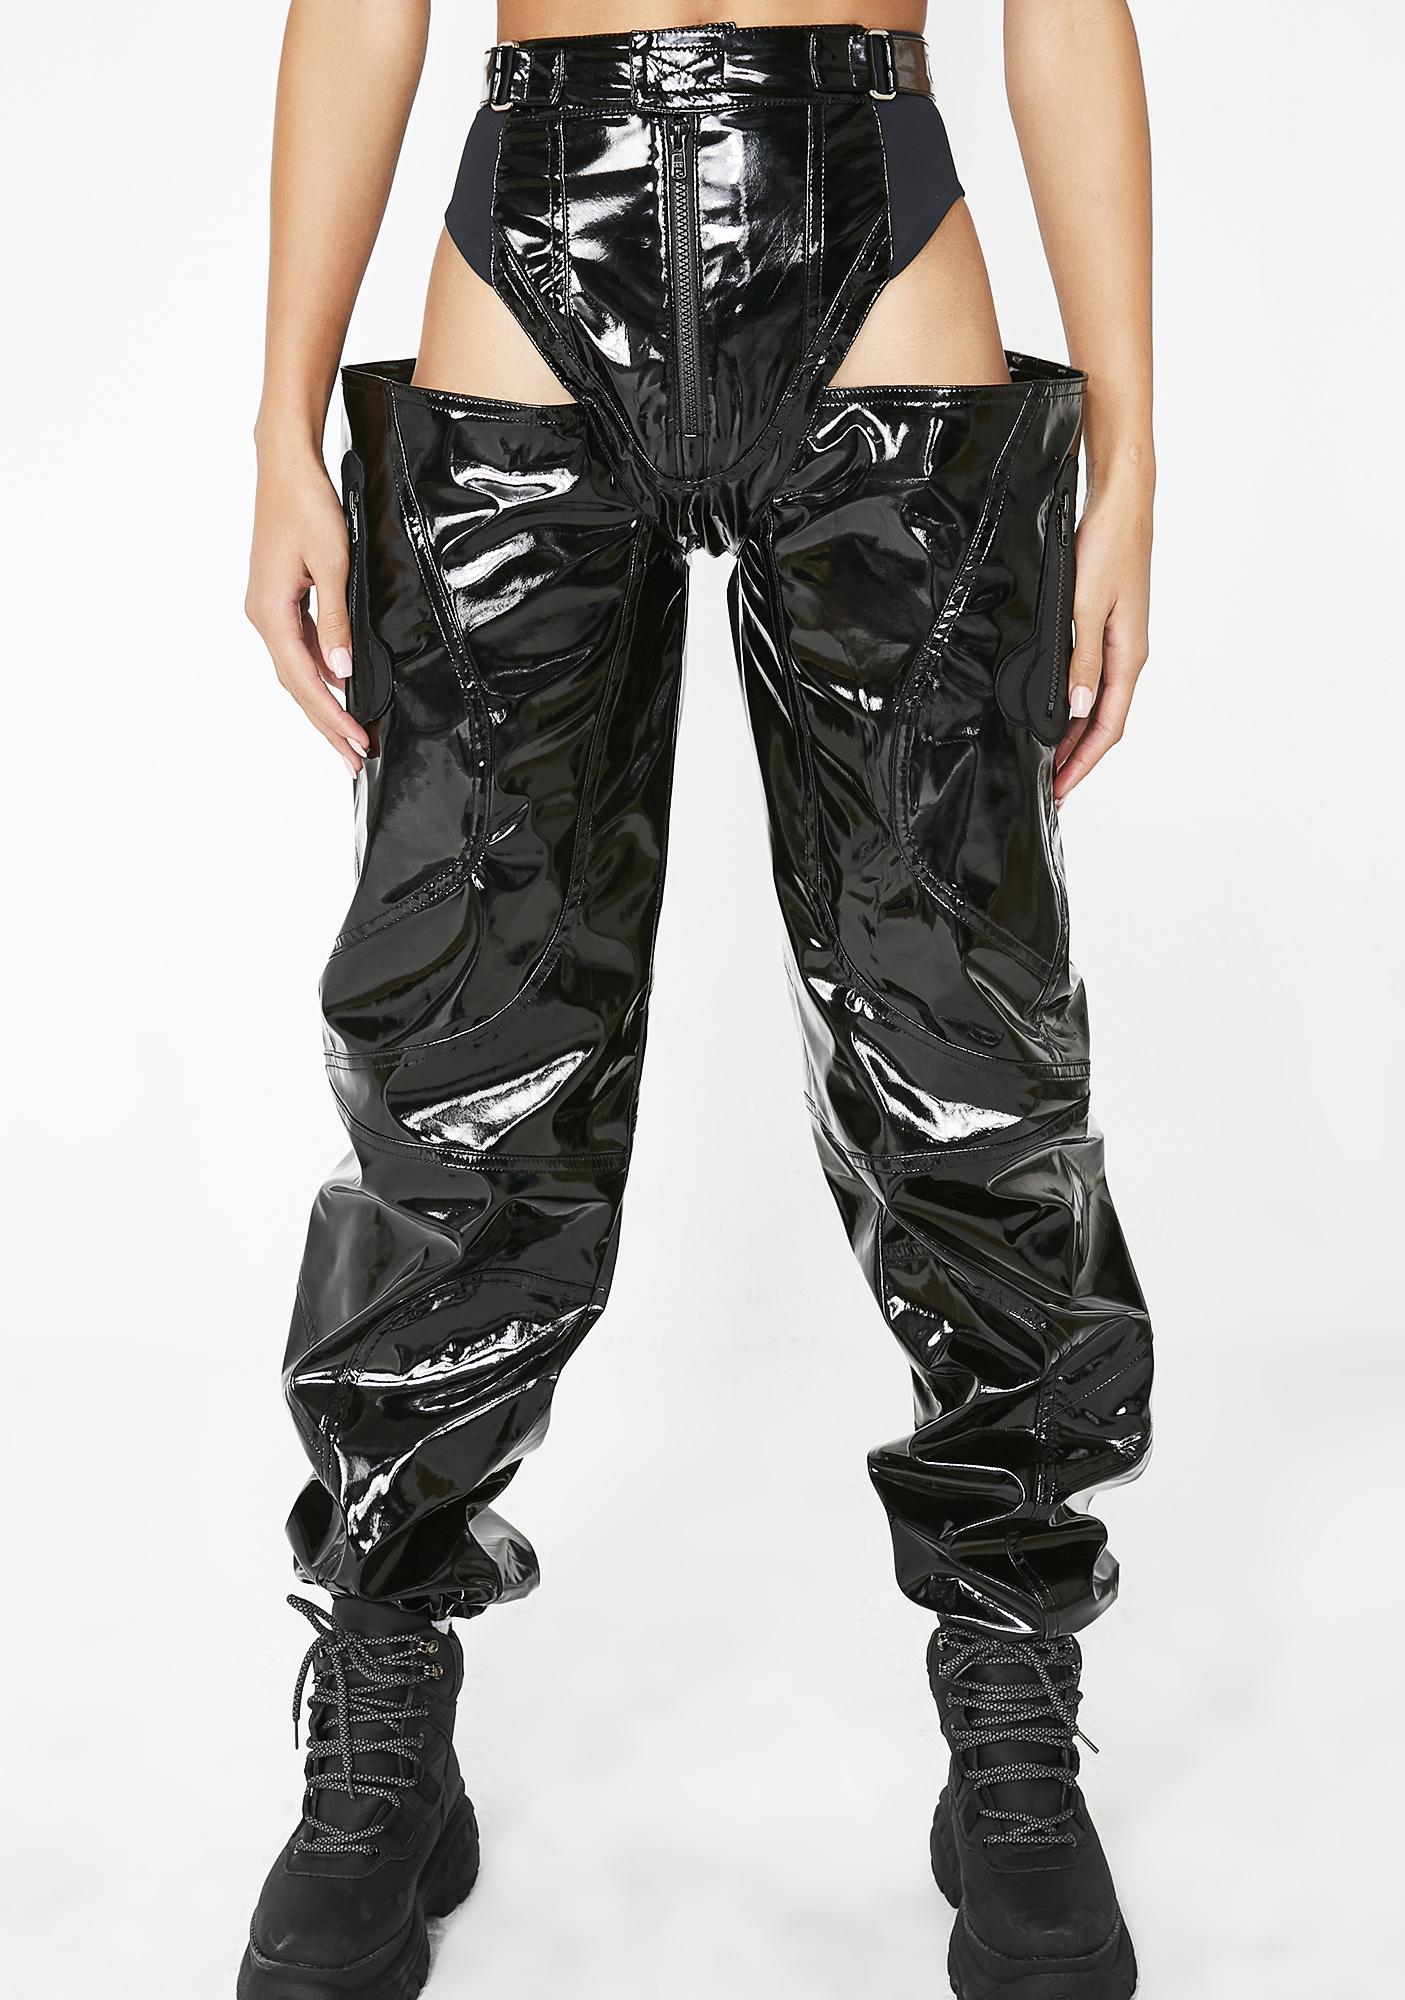 Namilia Panty Trouser Black Patent